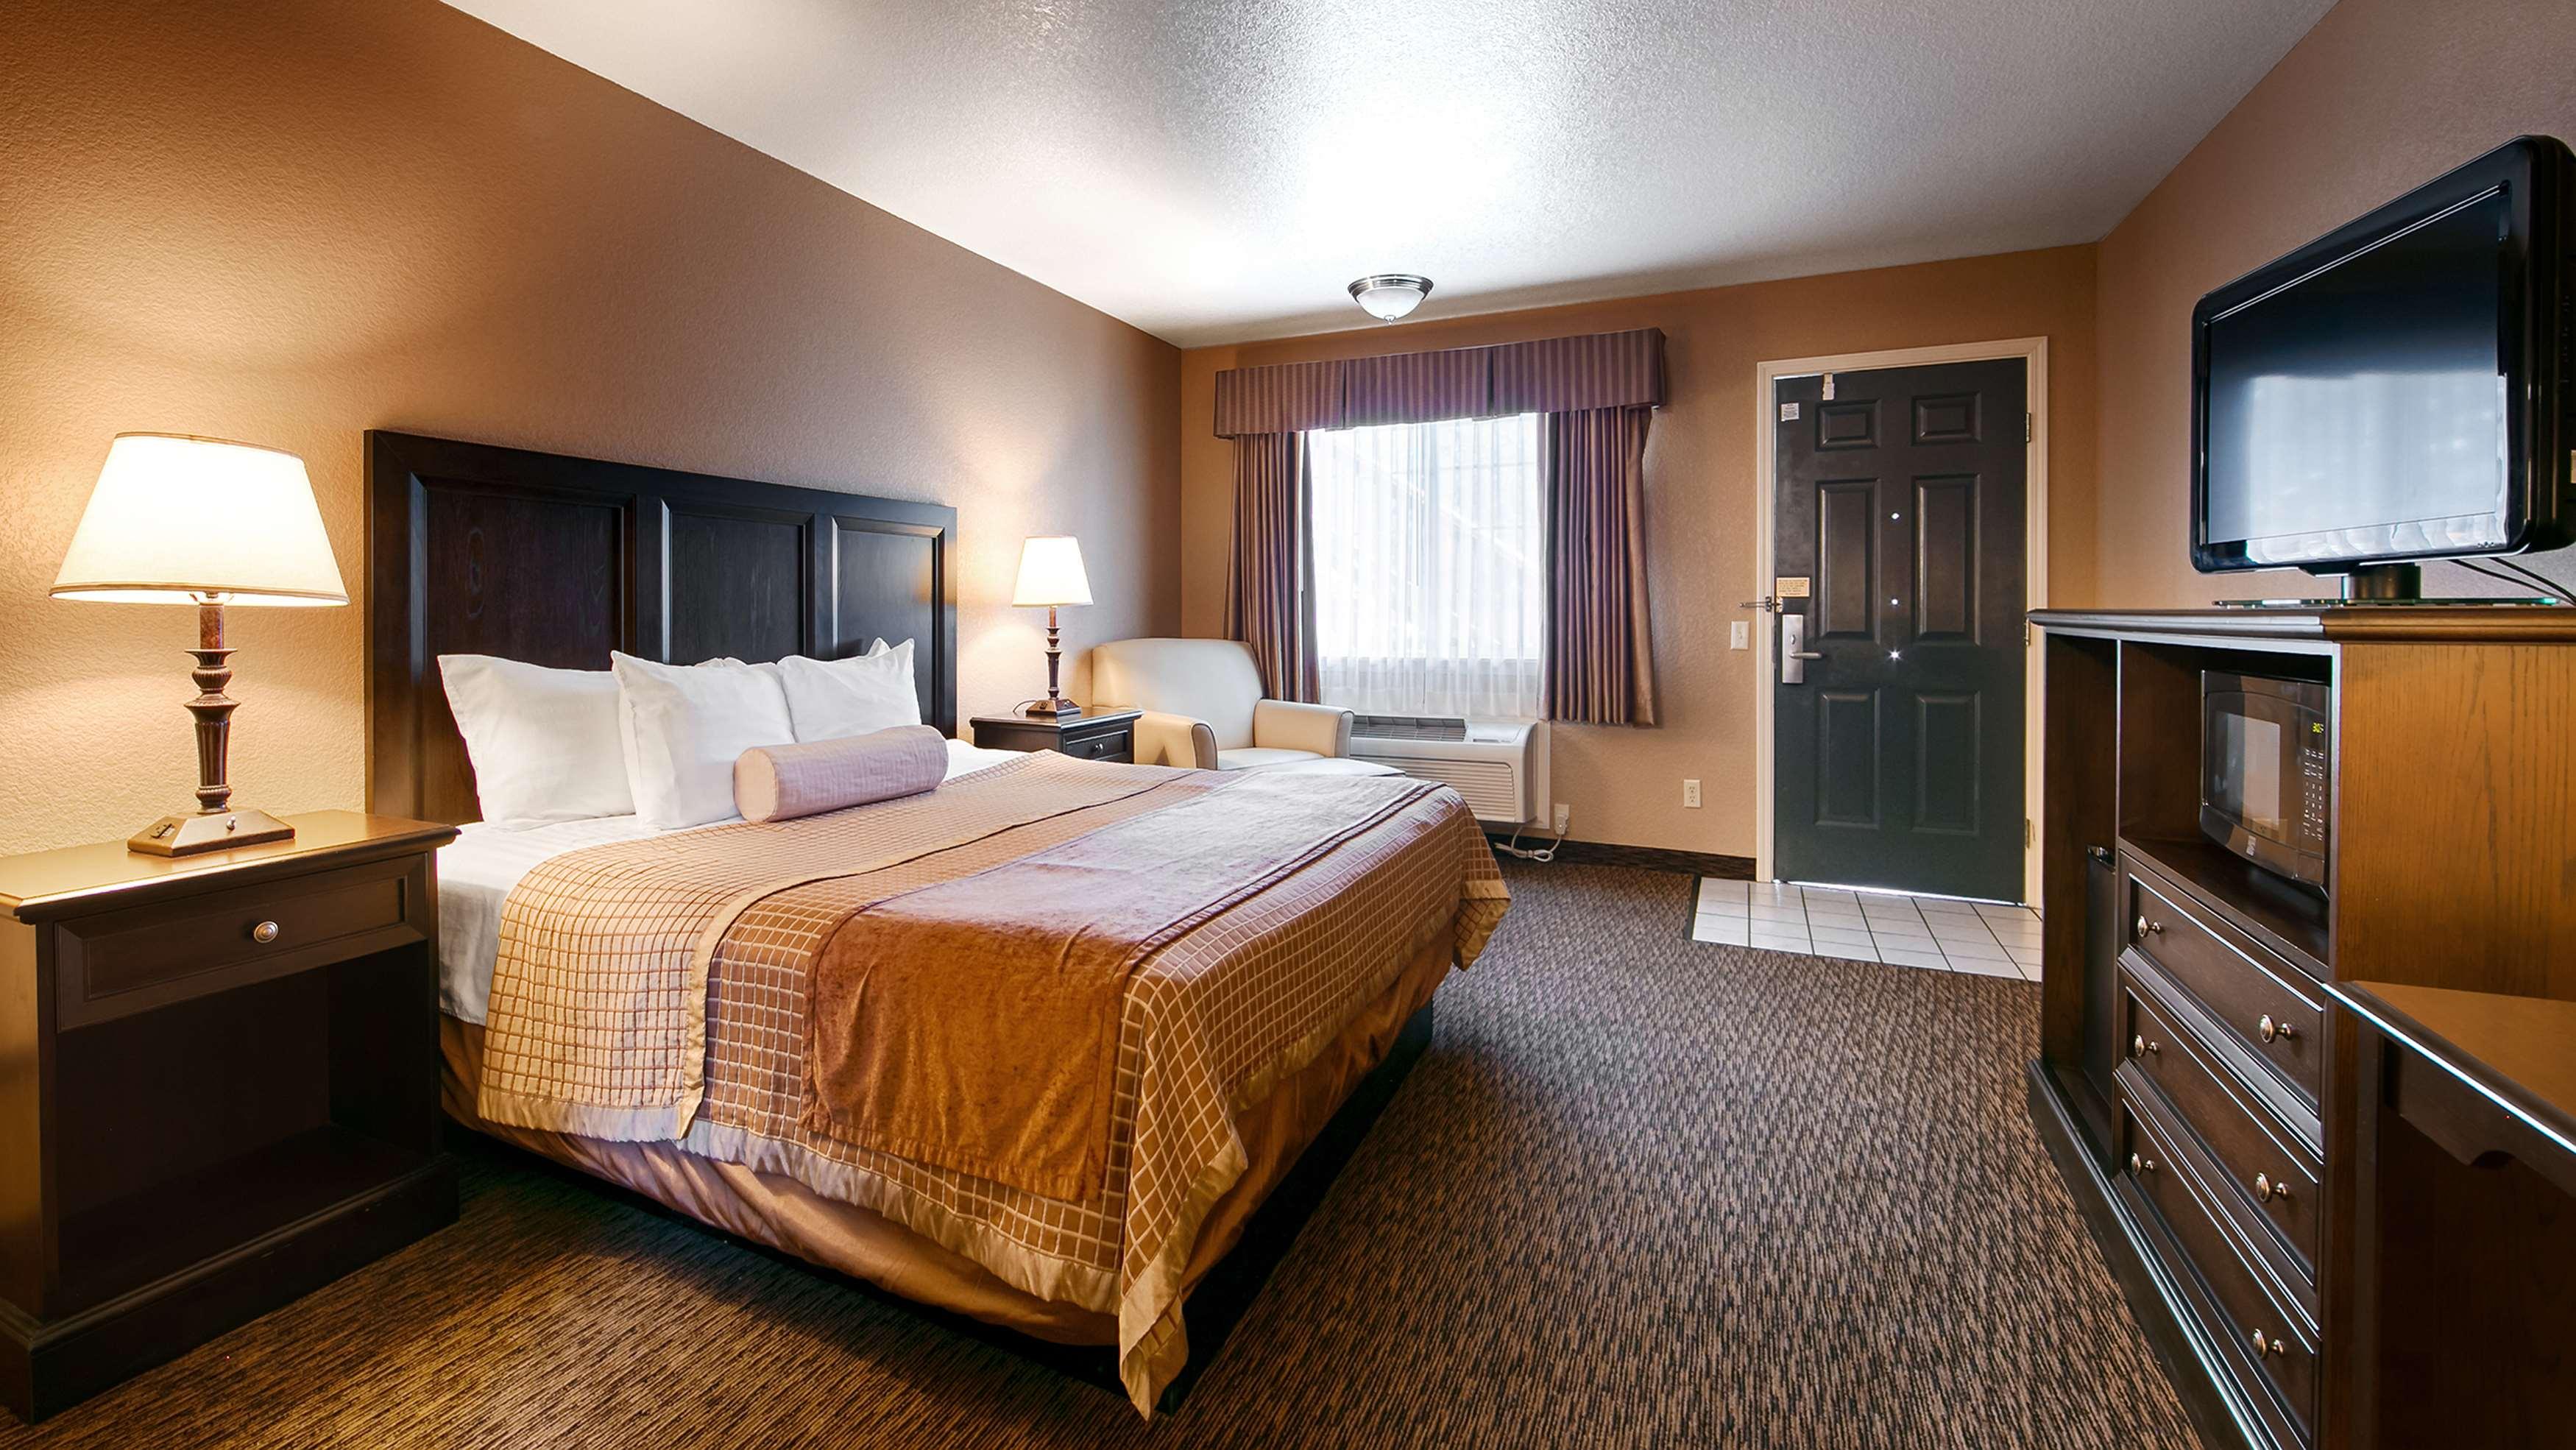 Fortuna Ca Hotels Motels